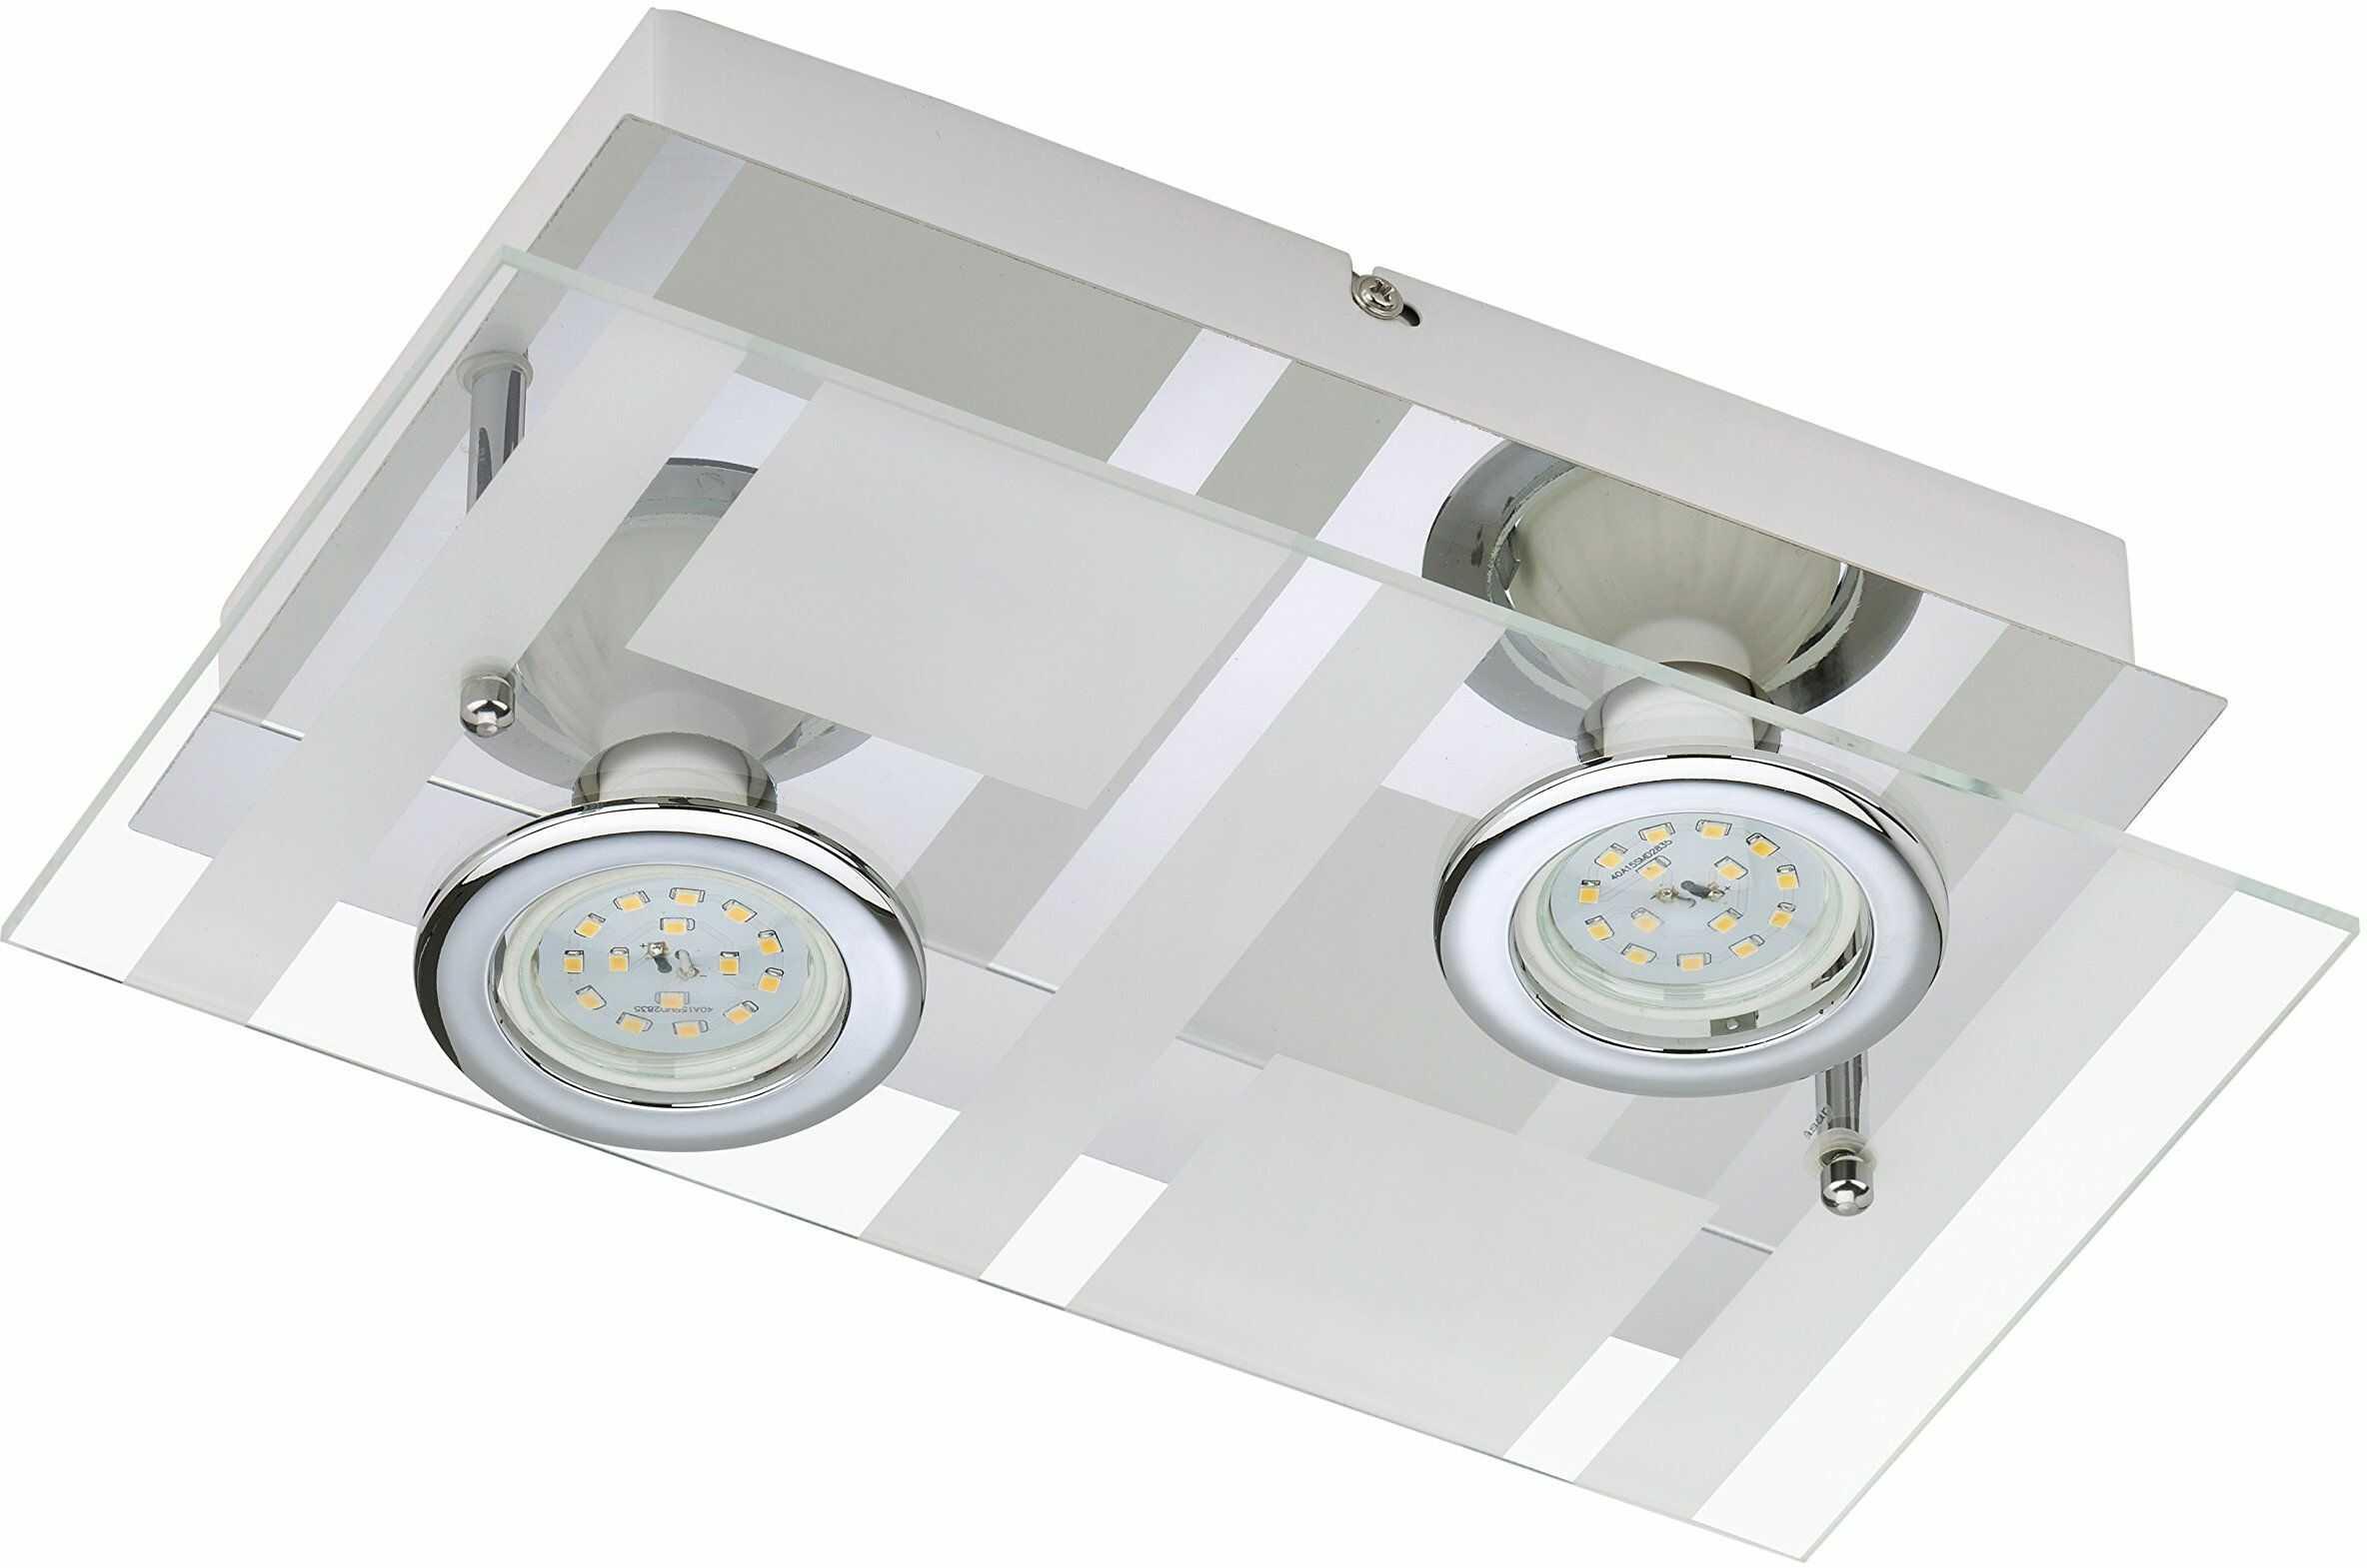 Briloner Leuchten Lampa ścienna LED 2 x 5 W, 400 lm, chrom 3551-028